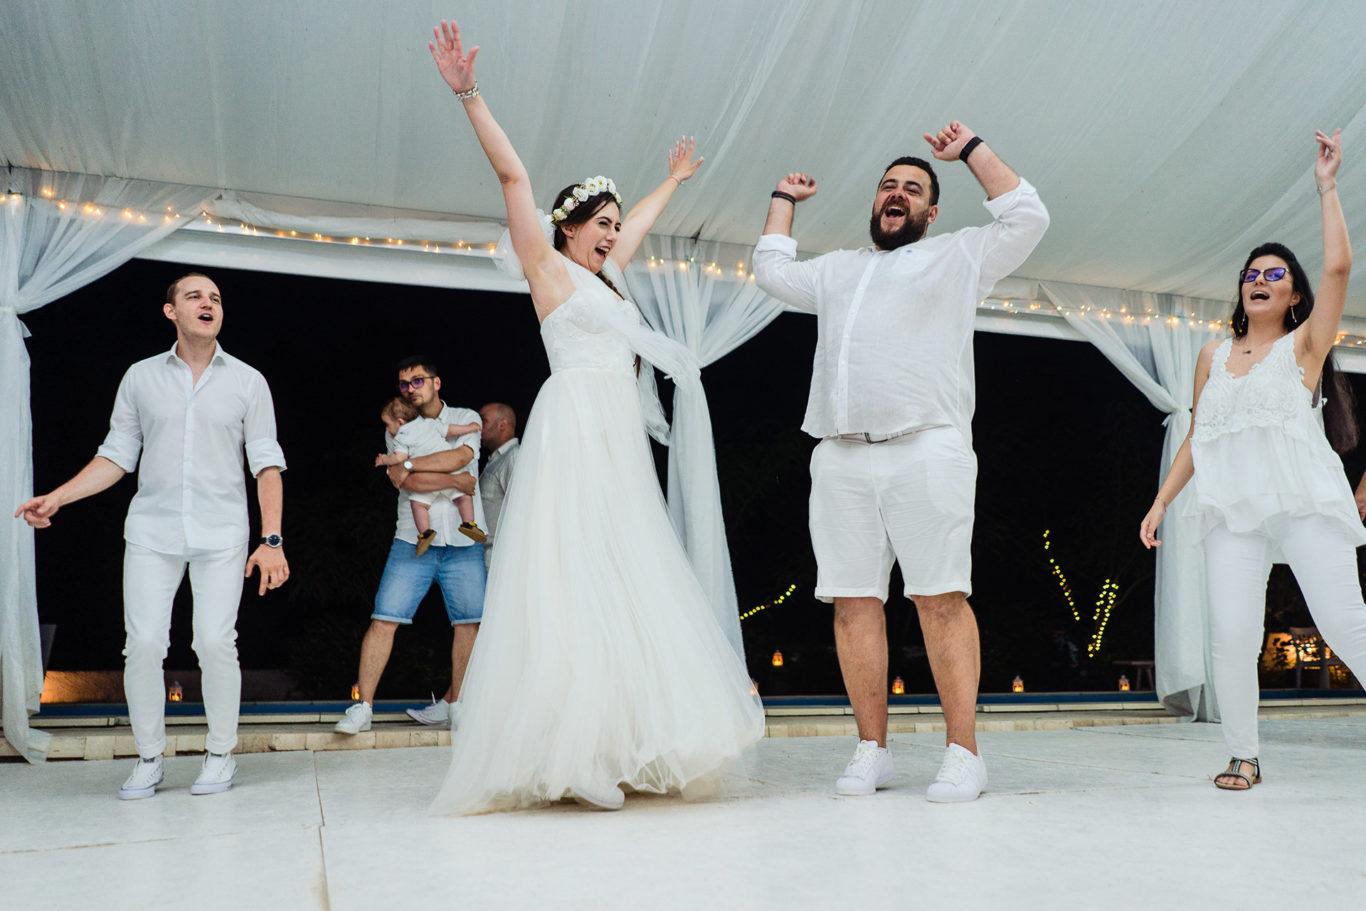 Nunta pe plaja @ Olimp | fotograf nunta Ciprian Dumitrescu